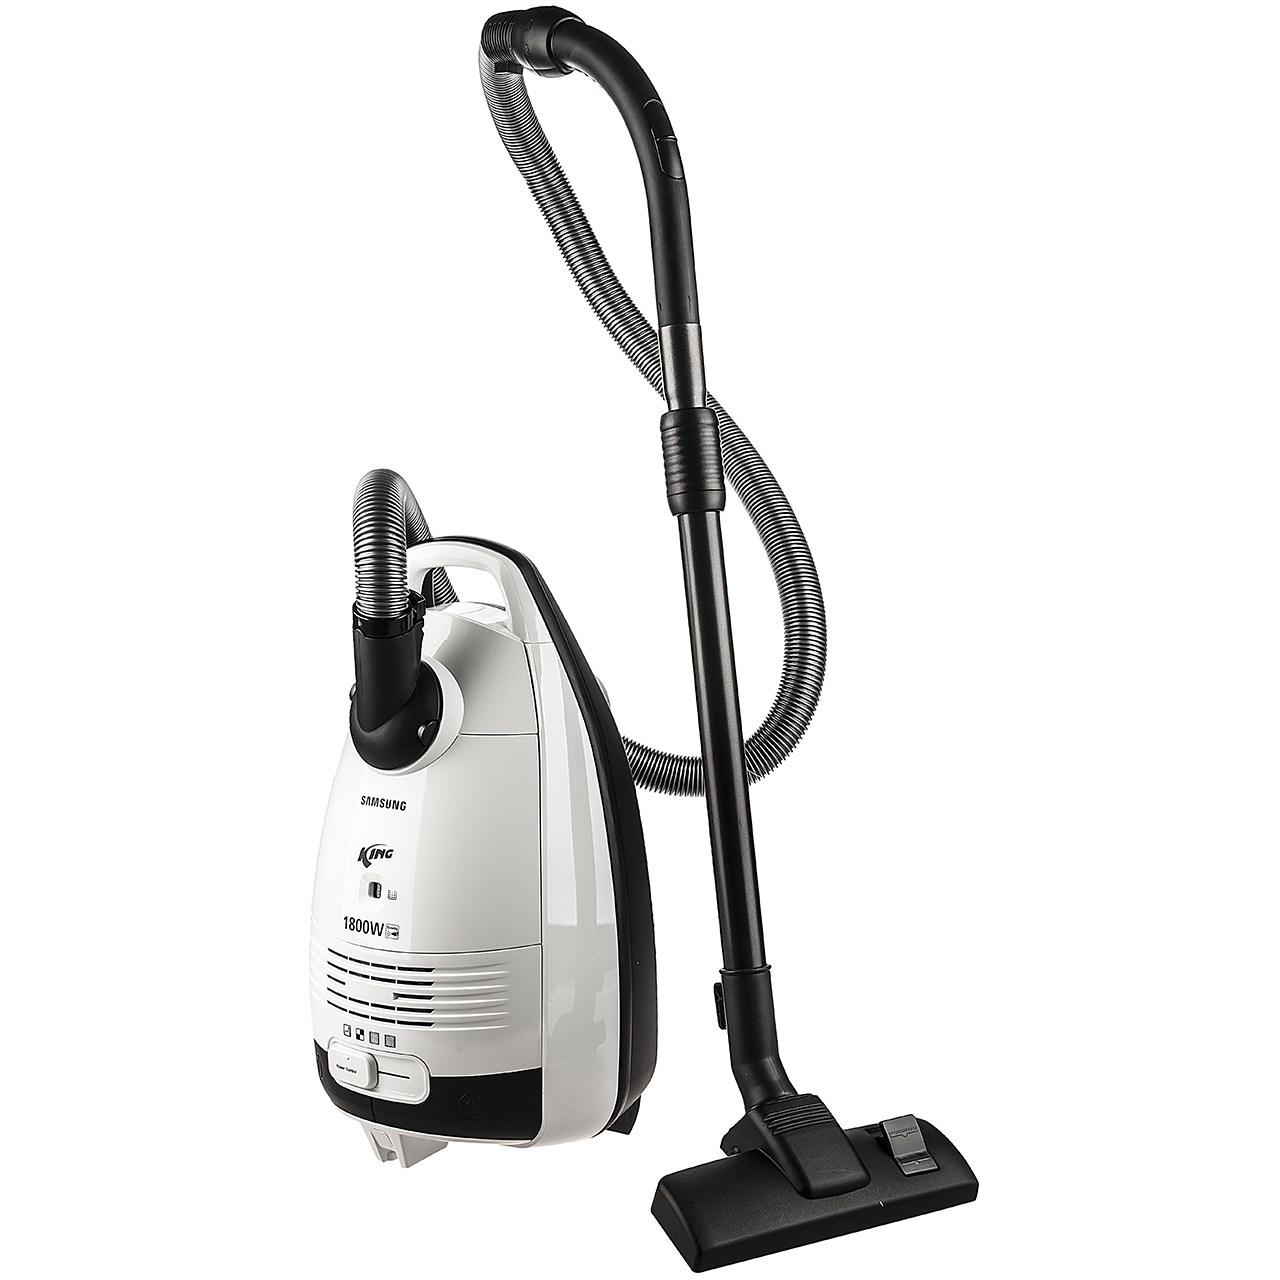 جارو برقی سامسونگ مدل KING-18 | Samsung KING-18 Vacuum Cleaner